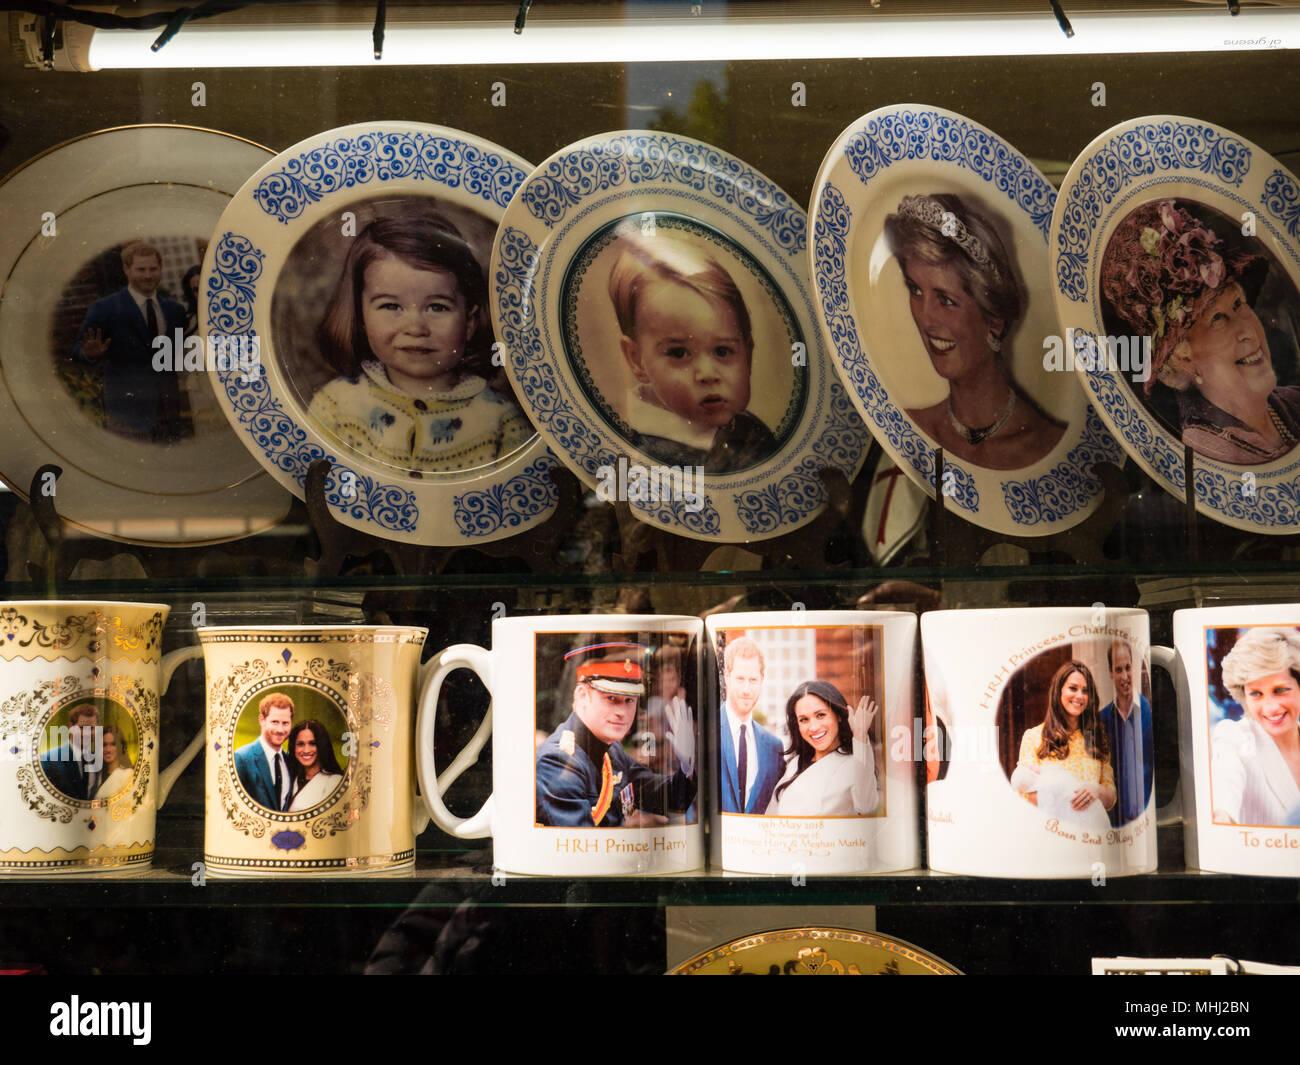 Royal Wedding 2018, Memorabilia, Shop Window, Windsor, Berkshire, England, UK, GB. - Stock Image